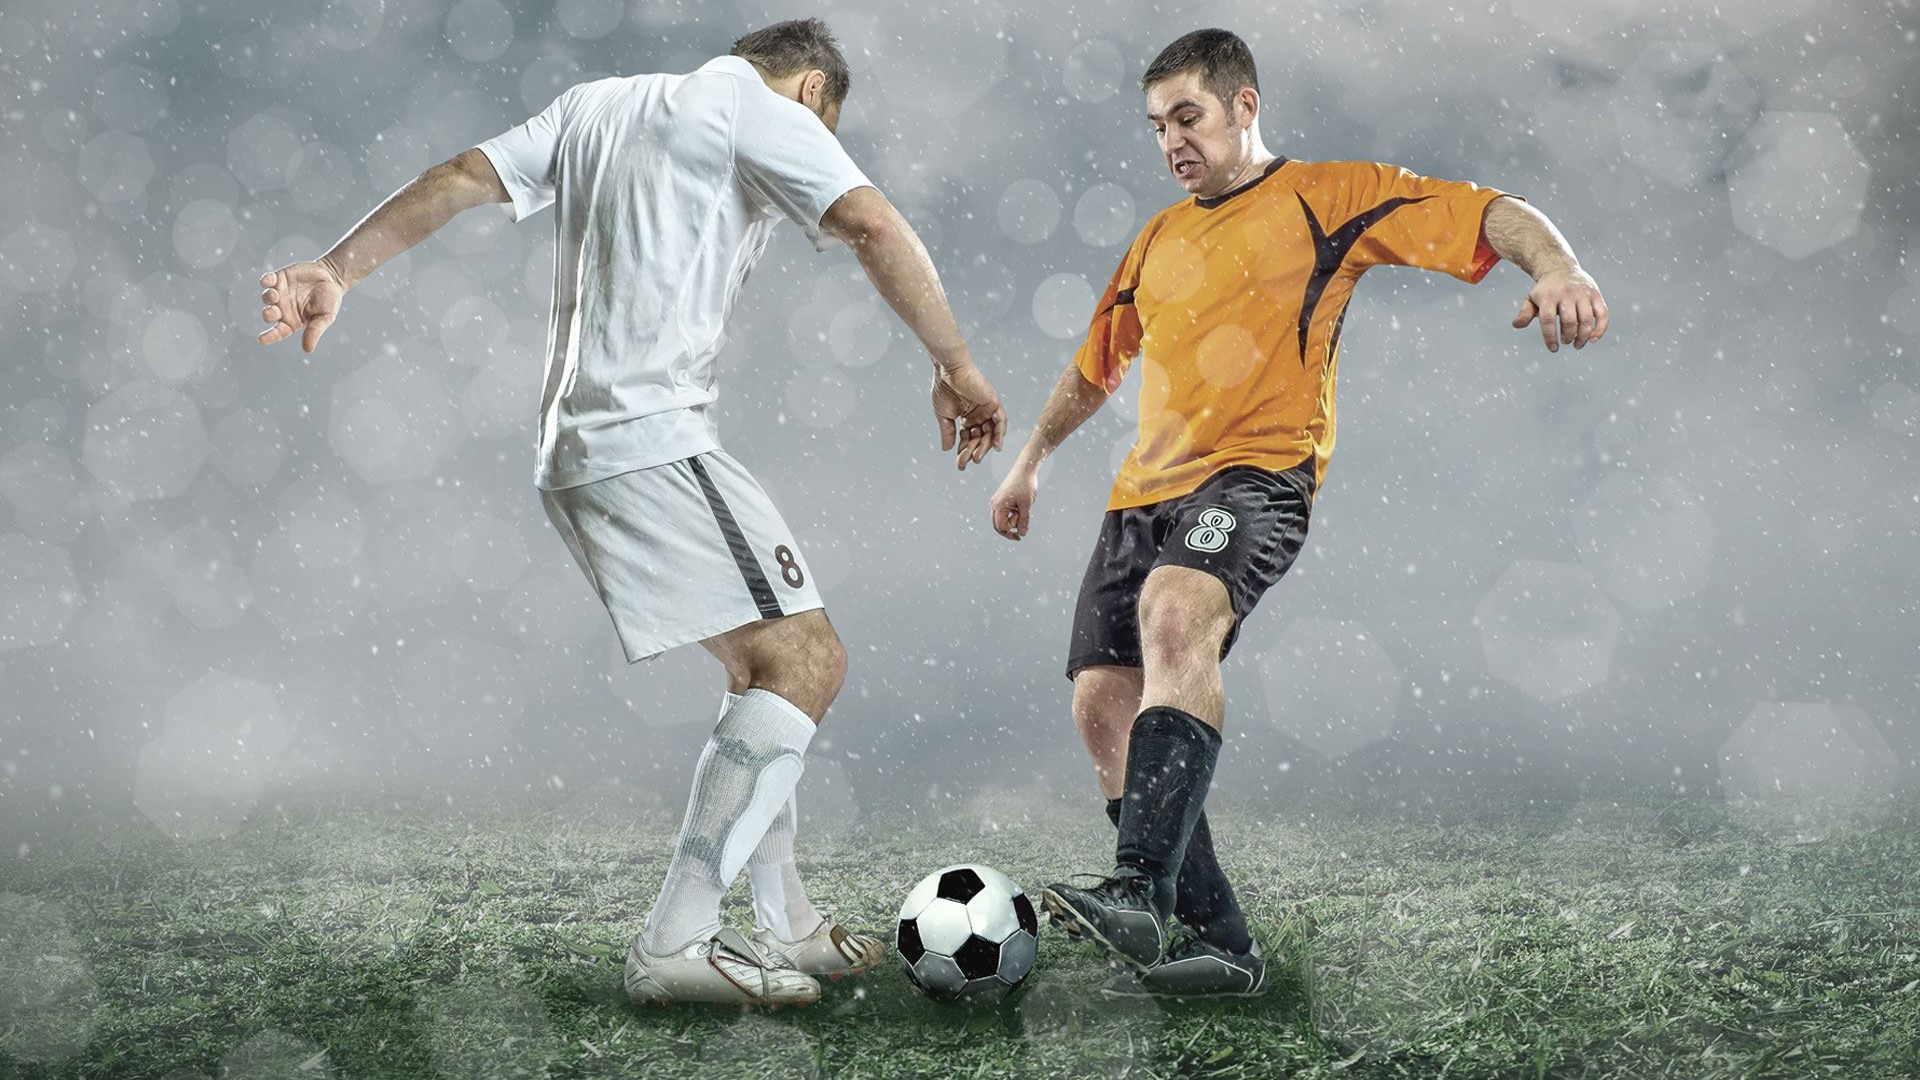 rugby-edinburgh-vs-munster-live-streaming